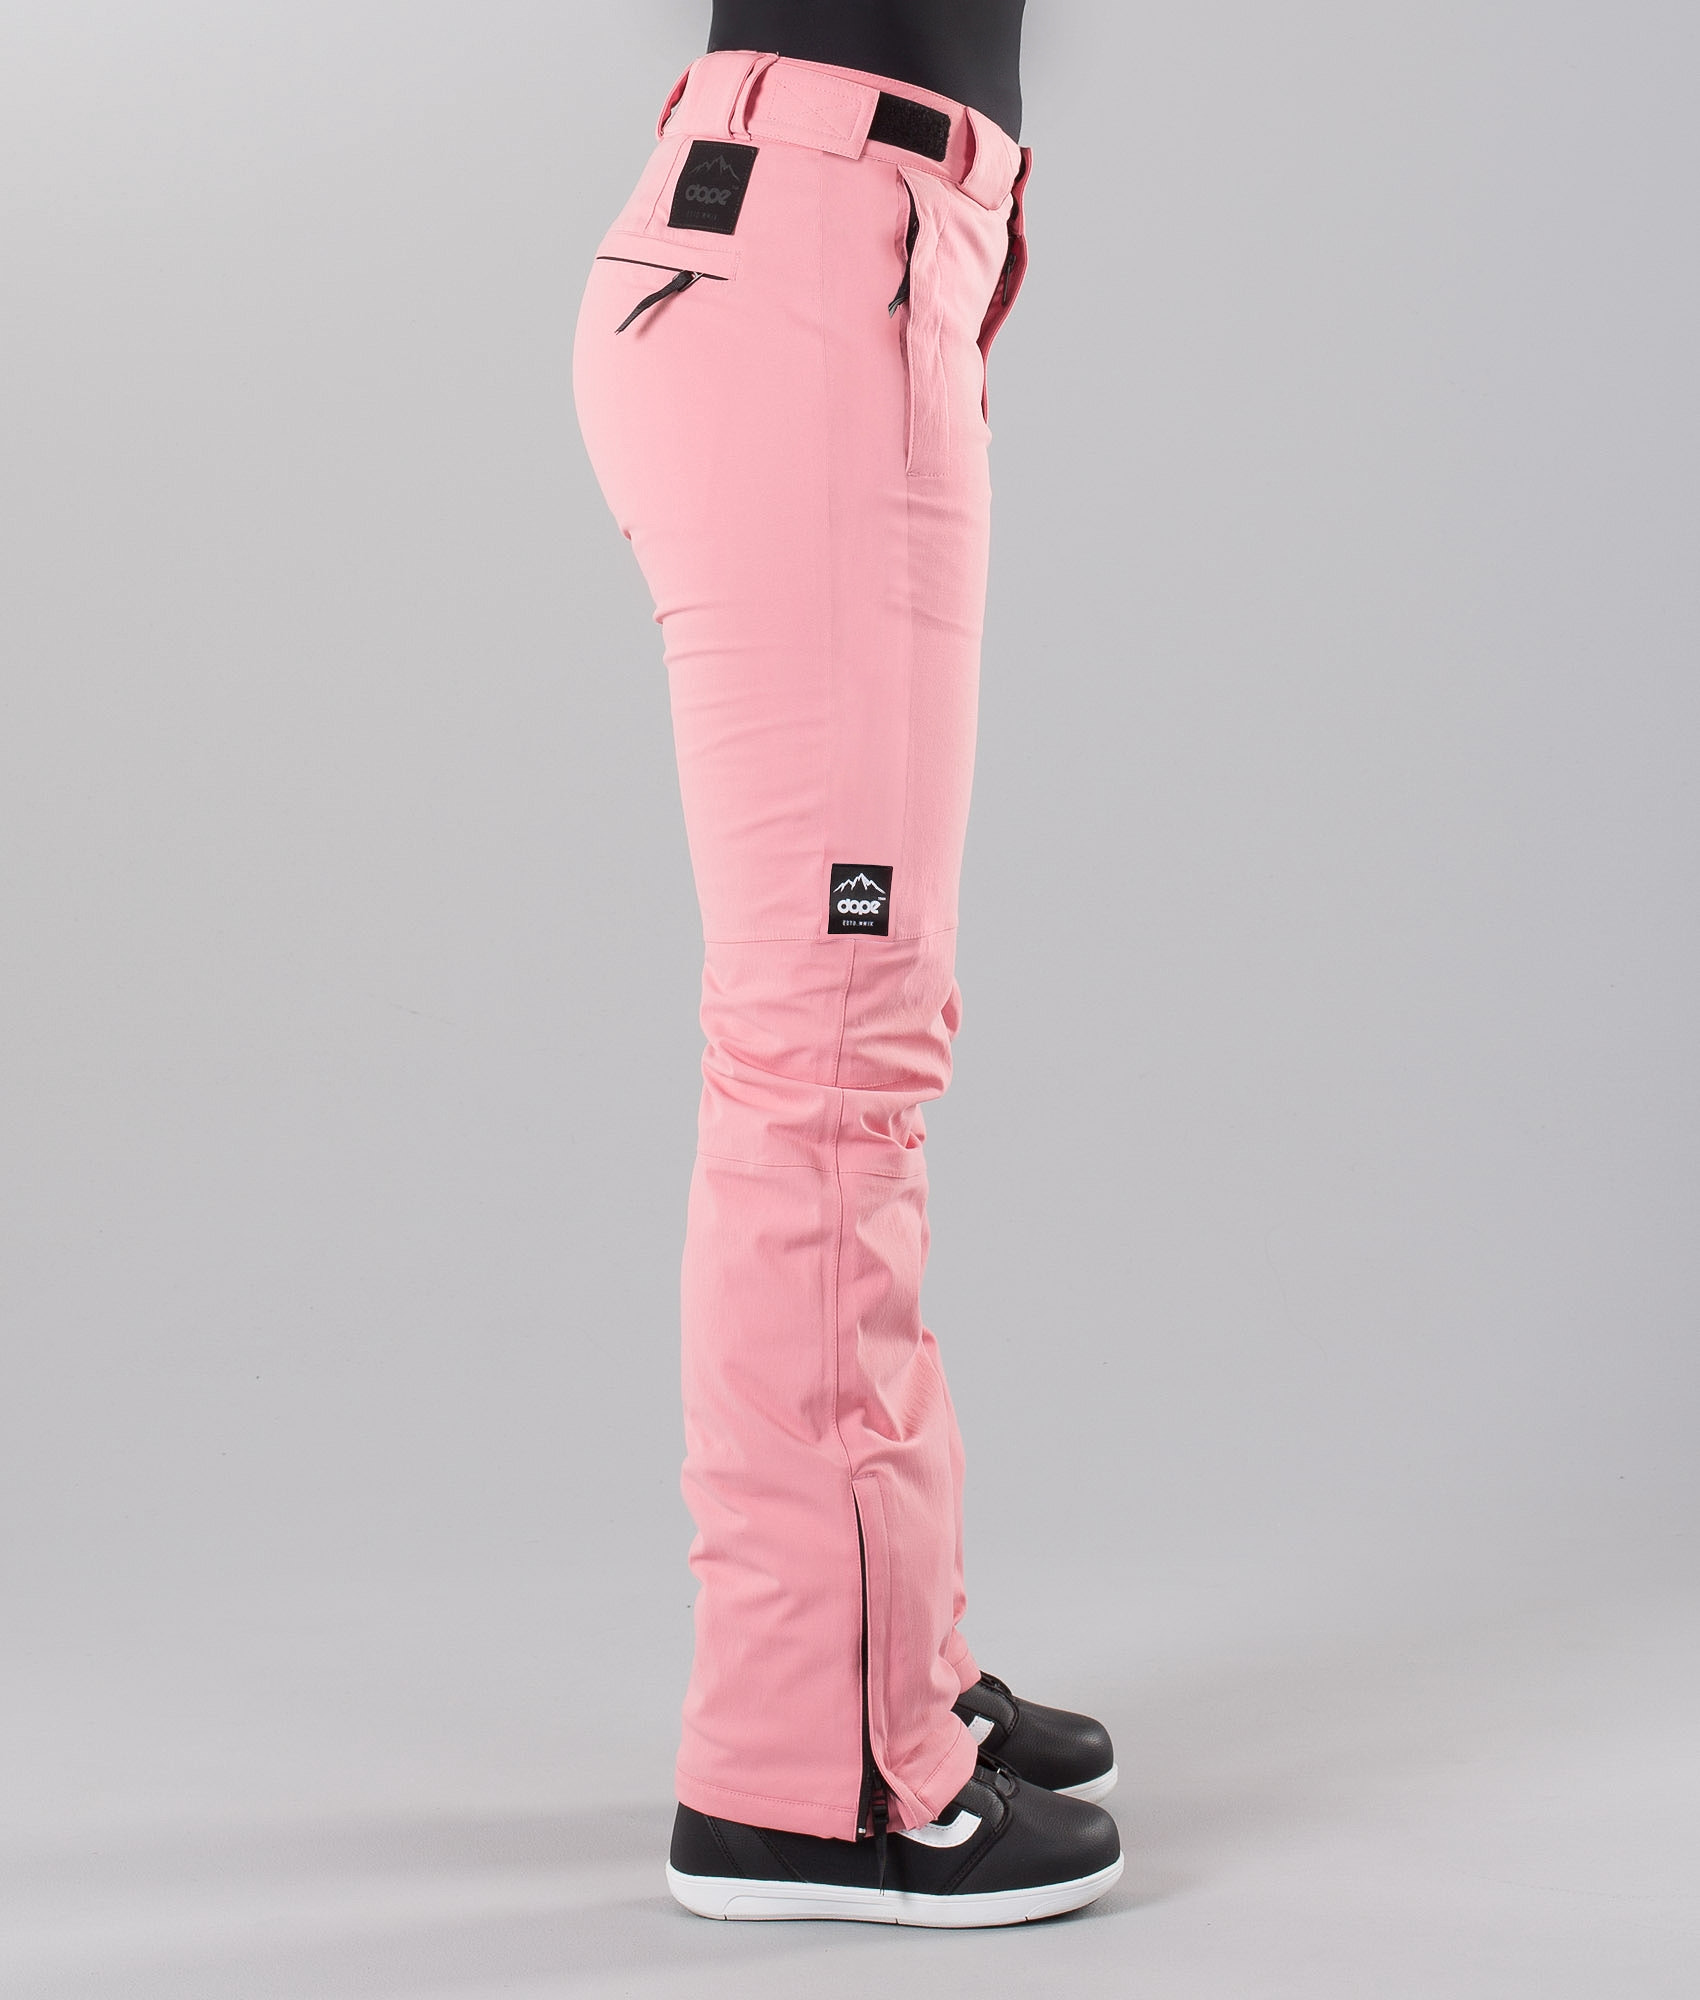 brand new 0dca2 7960e Dope Con Ski Pants